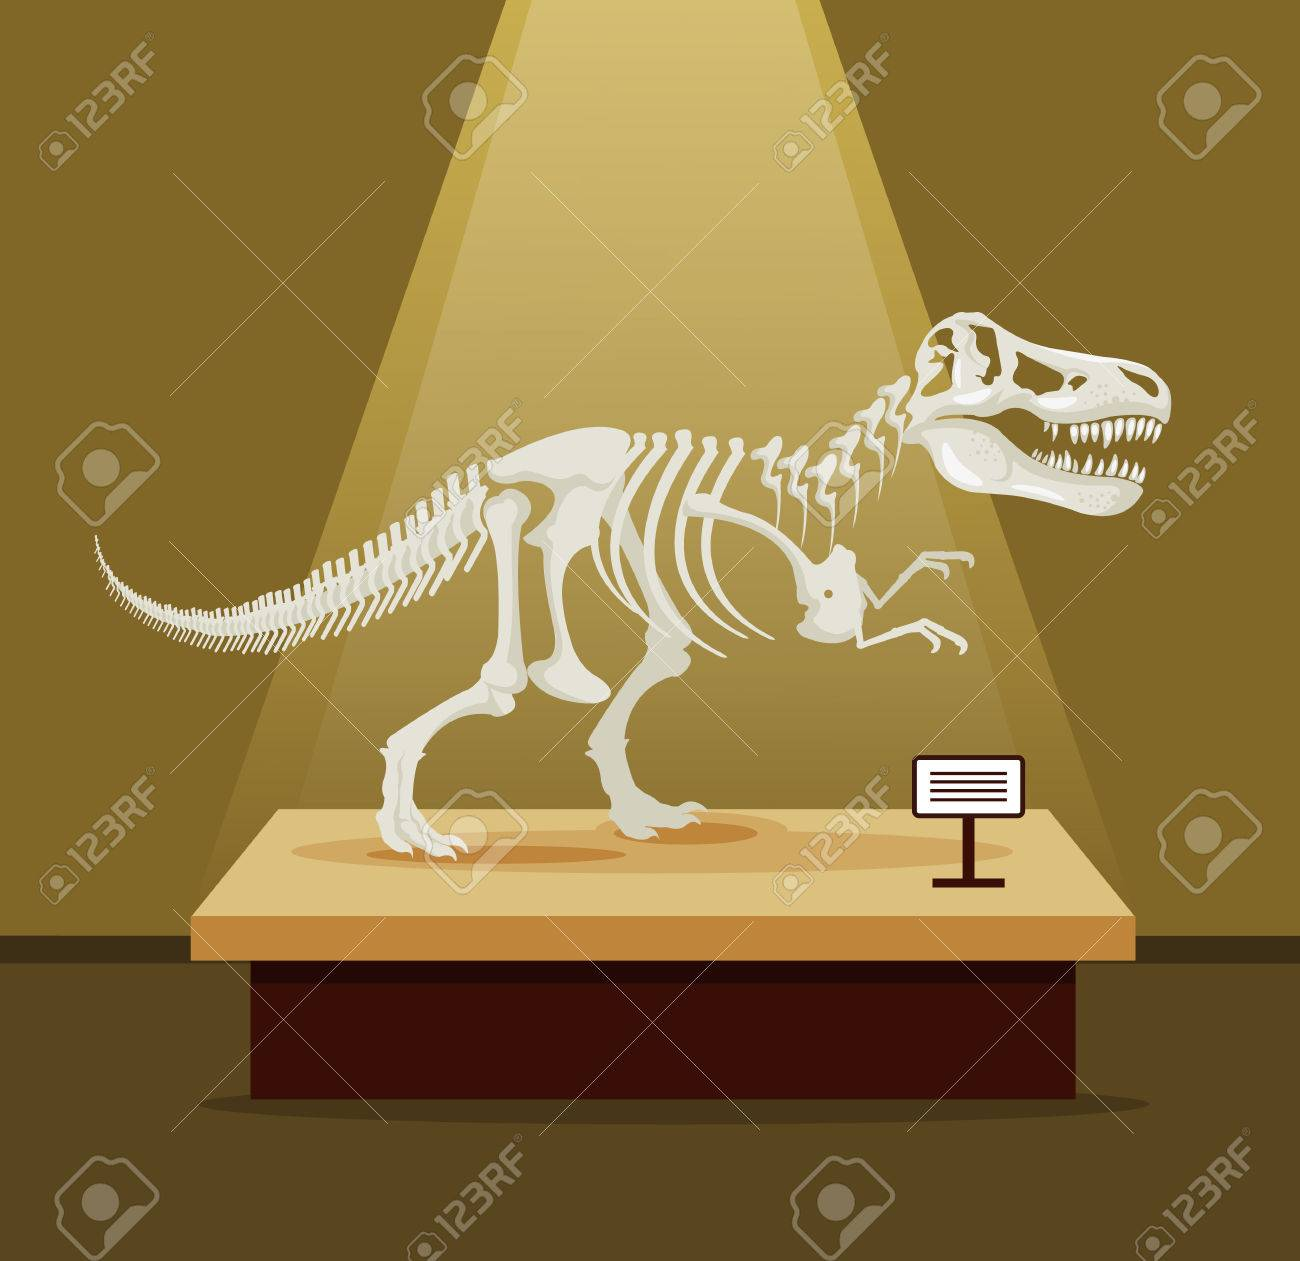 Tyrannosaur Rex bones skeleton in museum exhibition. Vector flat cartoon illustration. Dinosaurs museum - 57784016